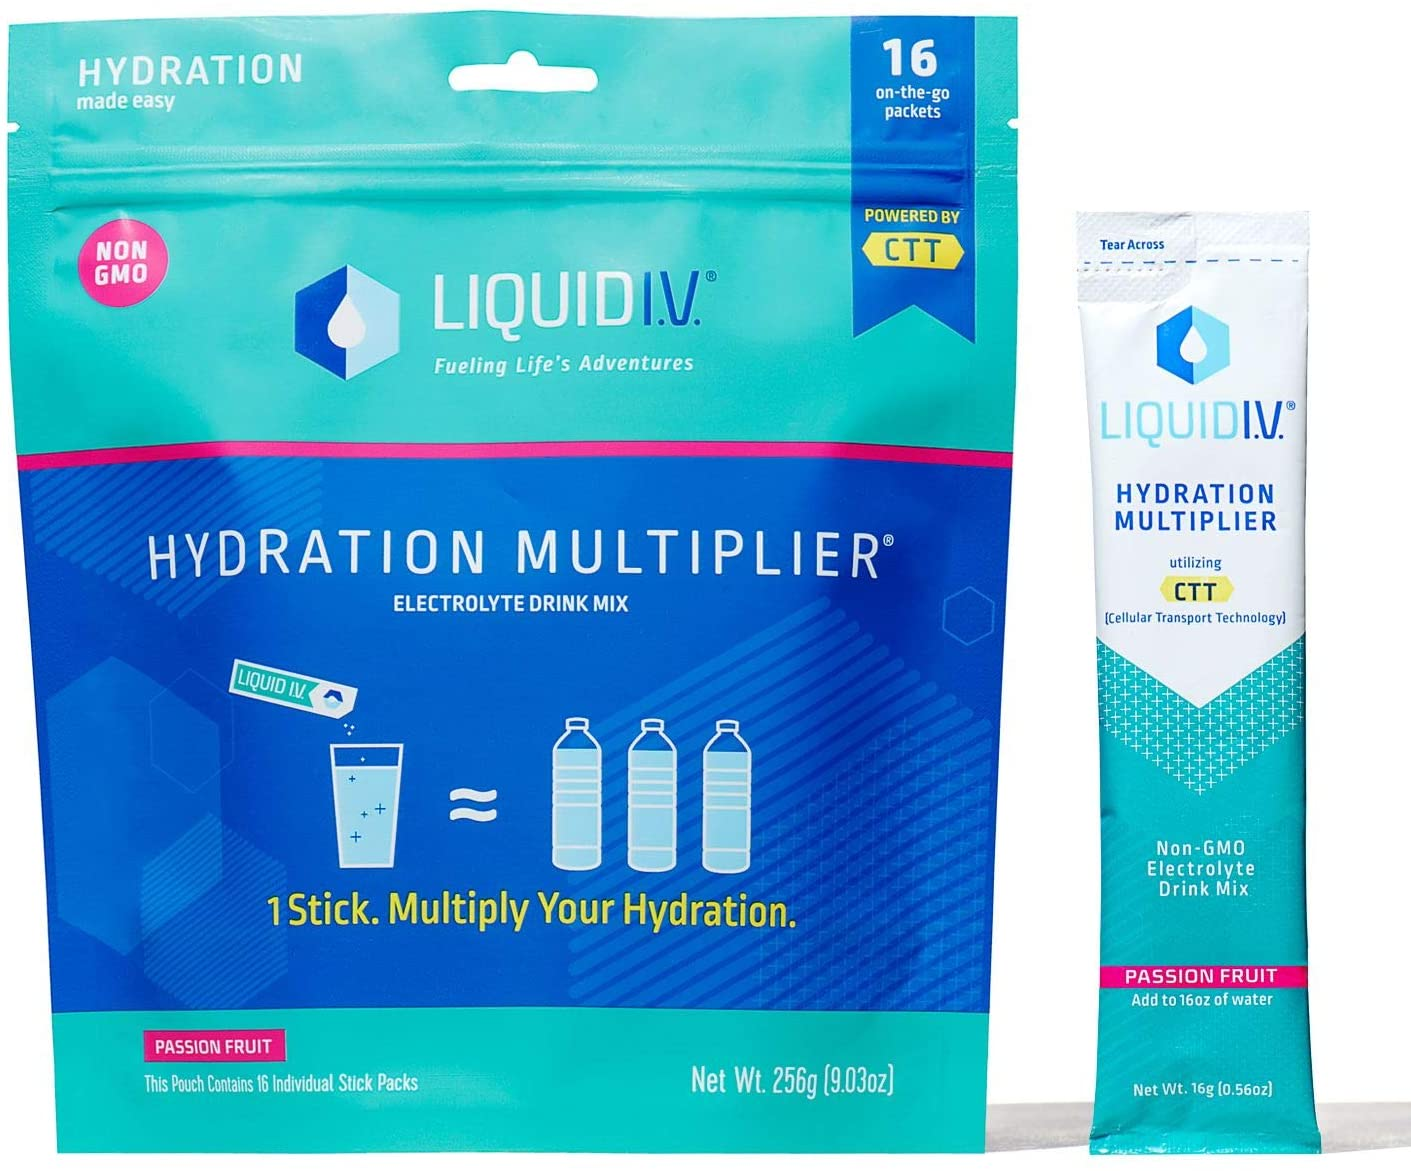 21st-birthday-gift-ideas-hydration